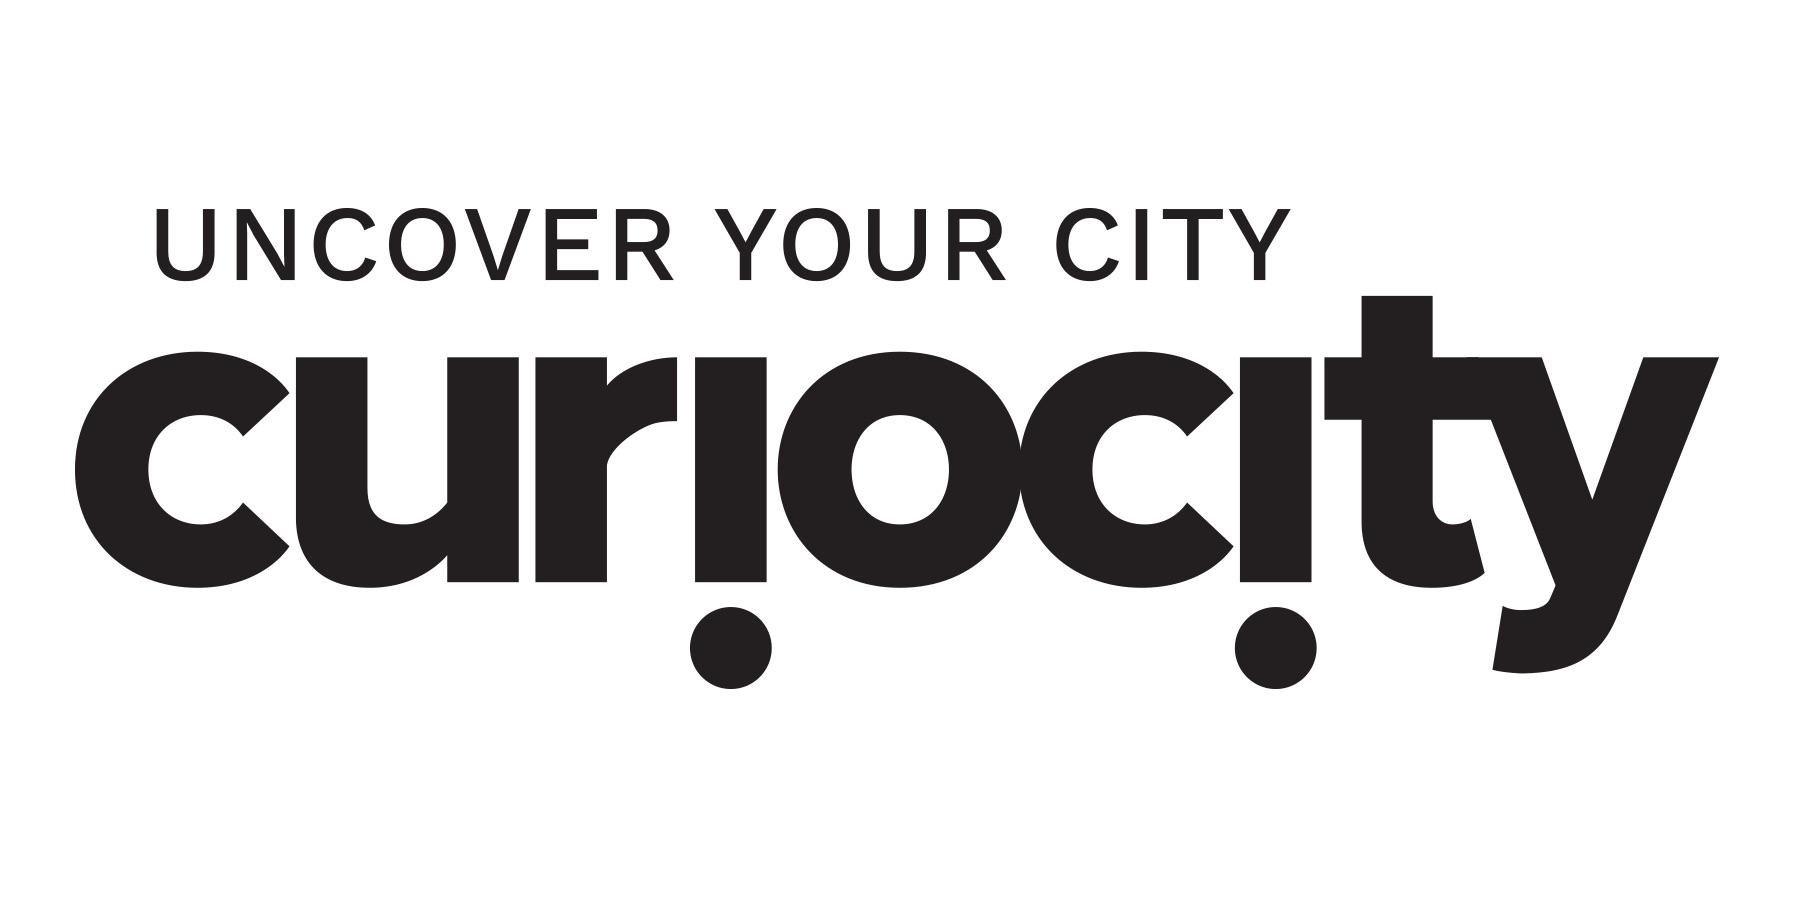 Curiocity Group Inc.